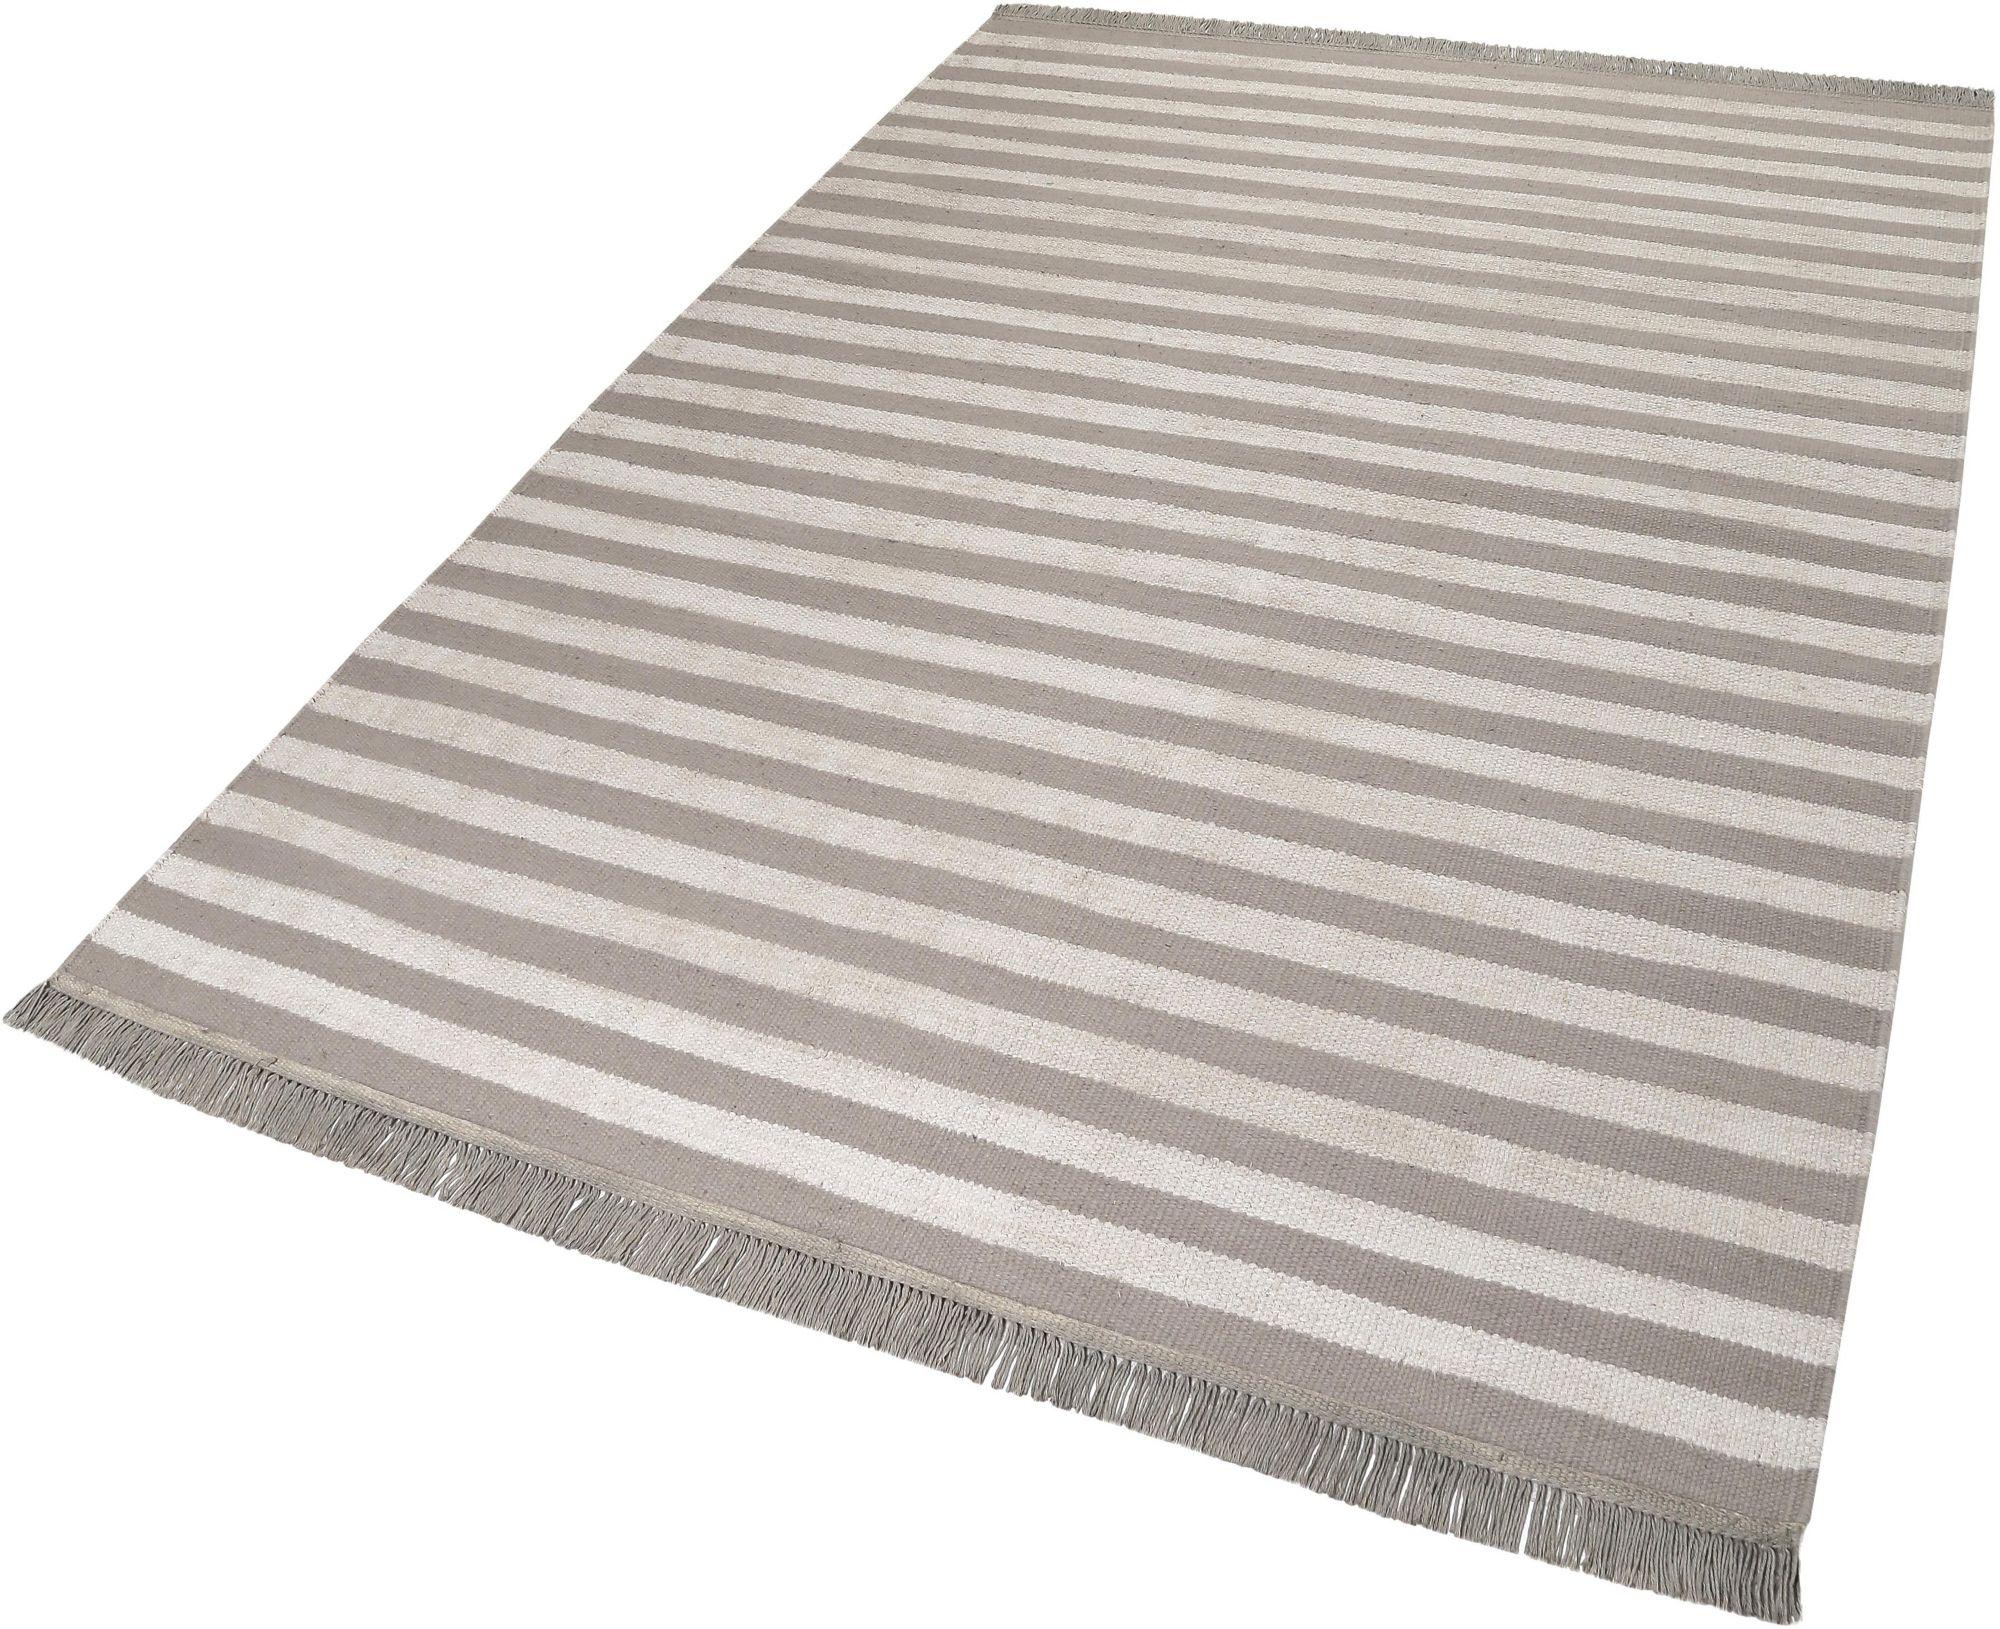 CARPETSCO Teppich, Carpets&Co, »Noble Stripes«, Höhe: 5 mm, handgewebt